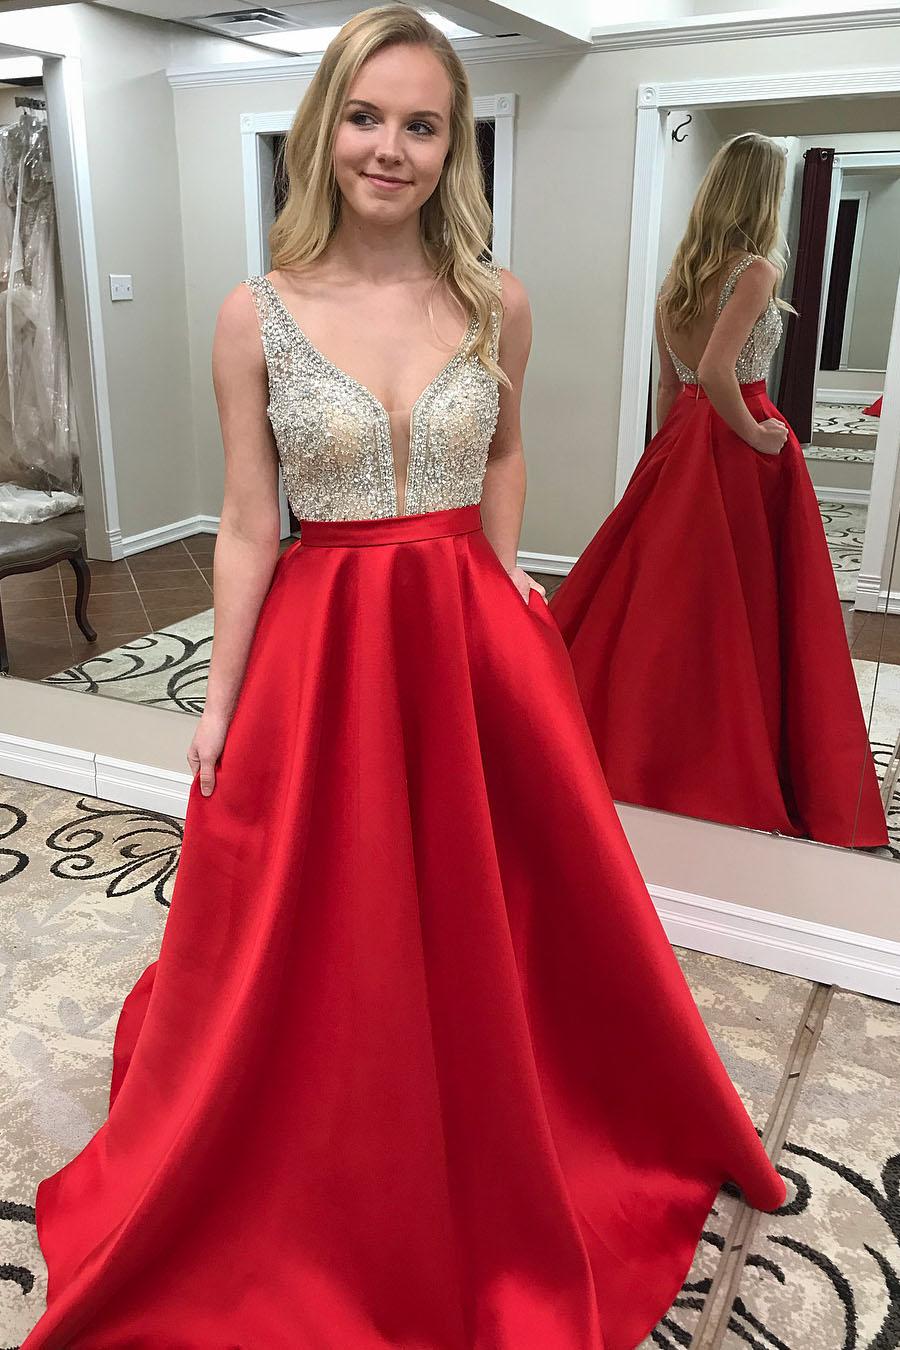 c156e3fcda5 Cute Off ths shoulder Pink Mid Calf Prom Dress Homecoming Dress ...